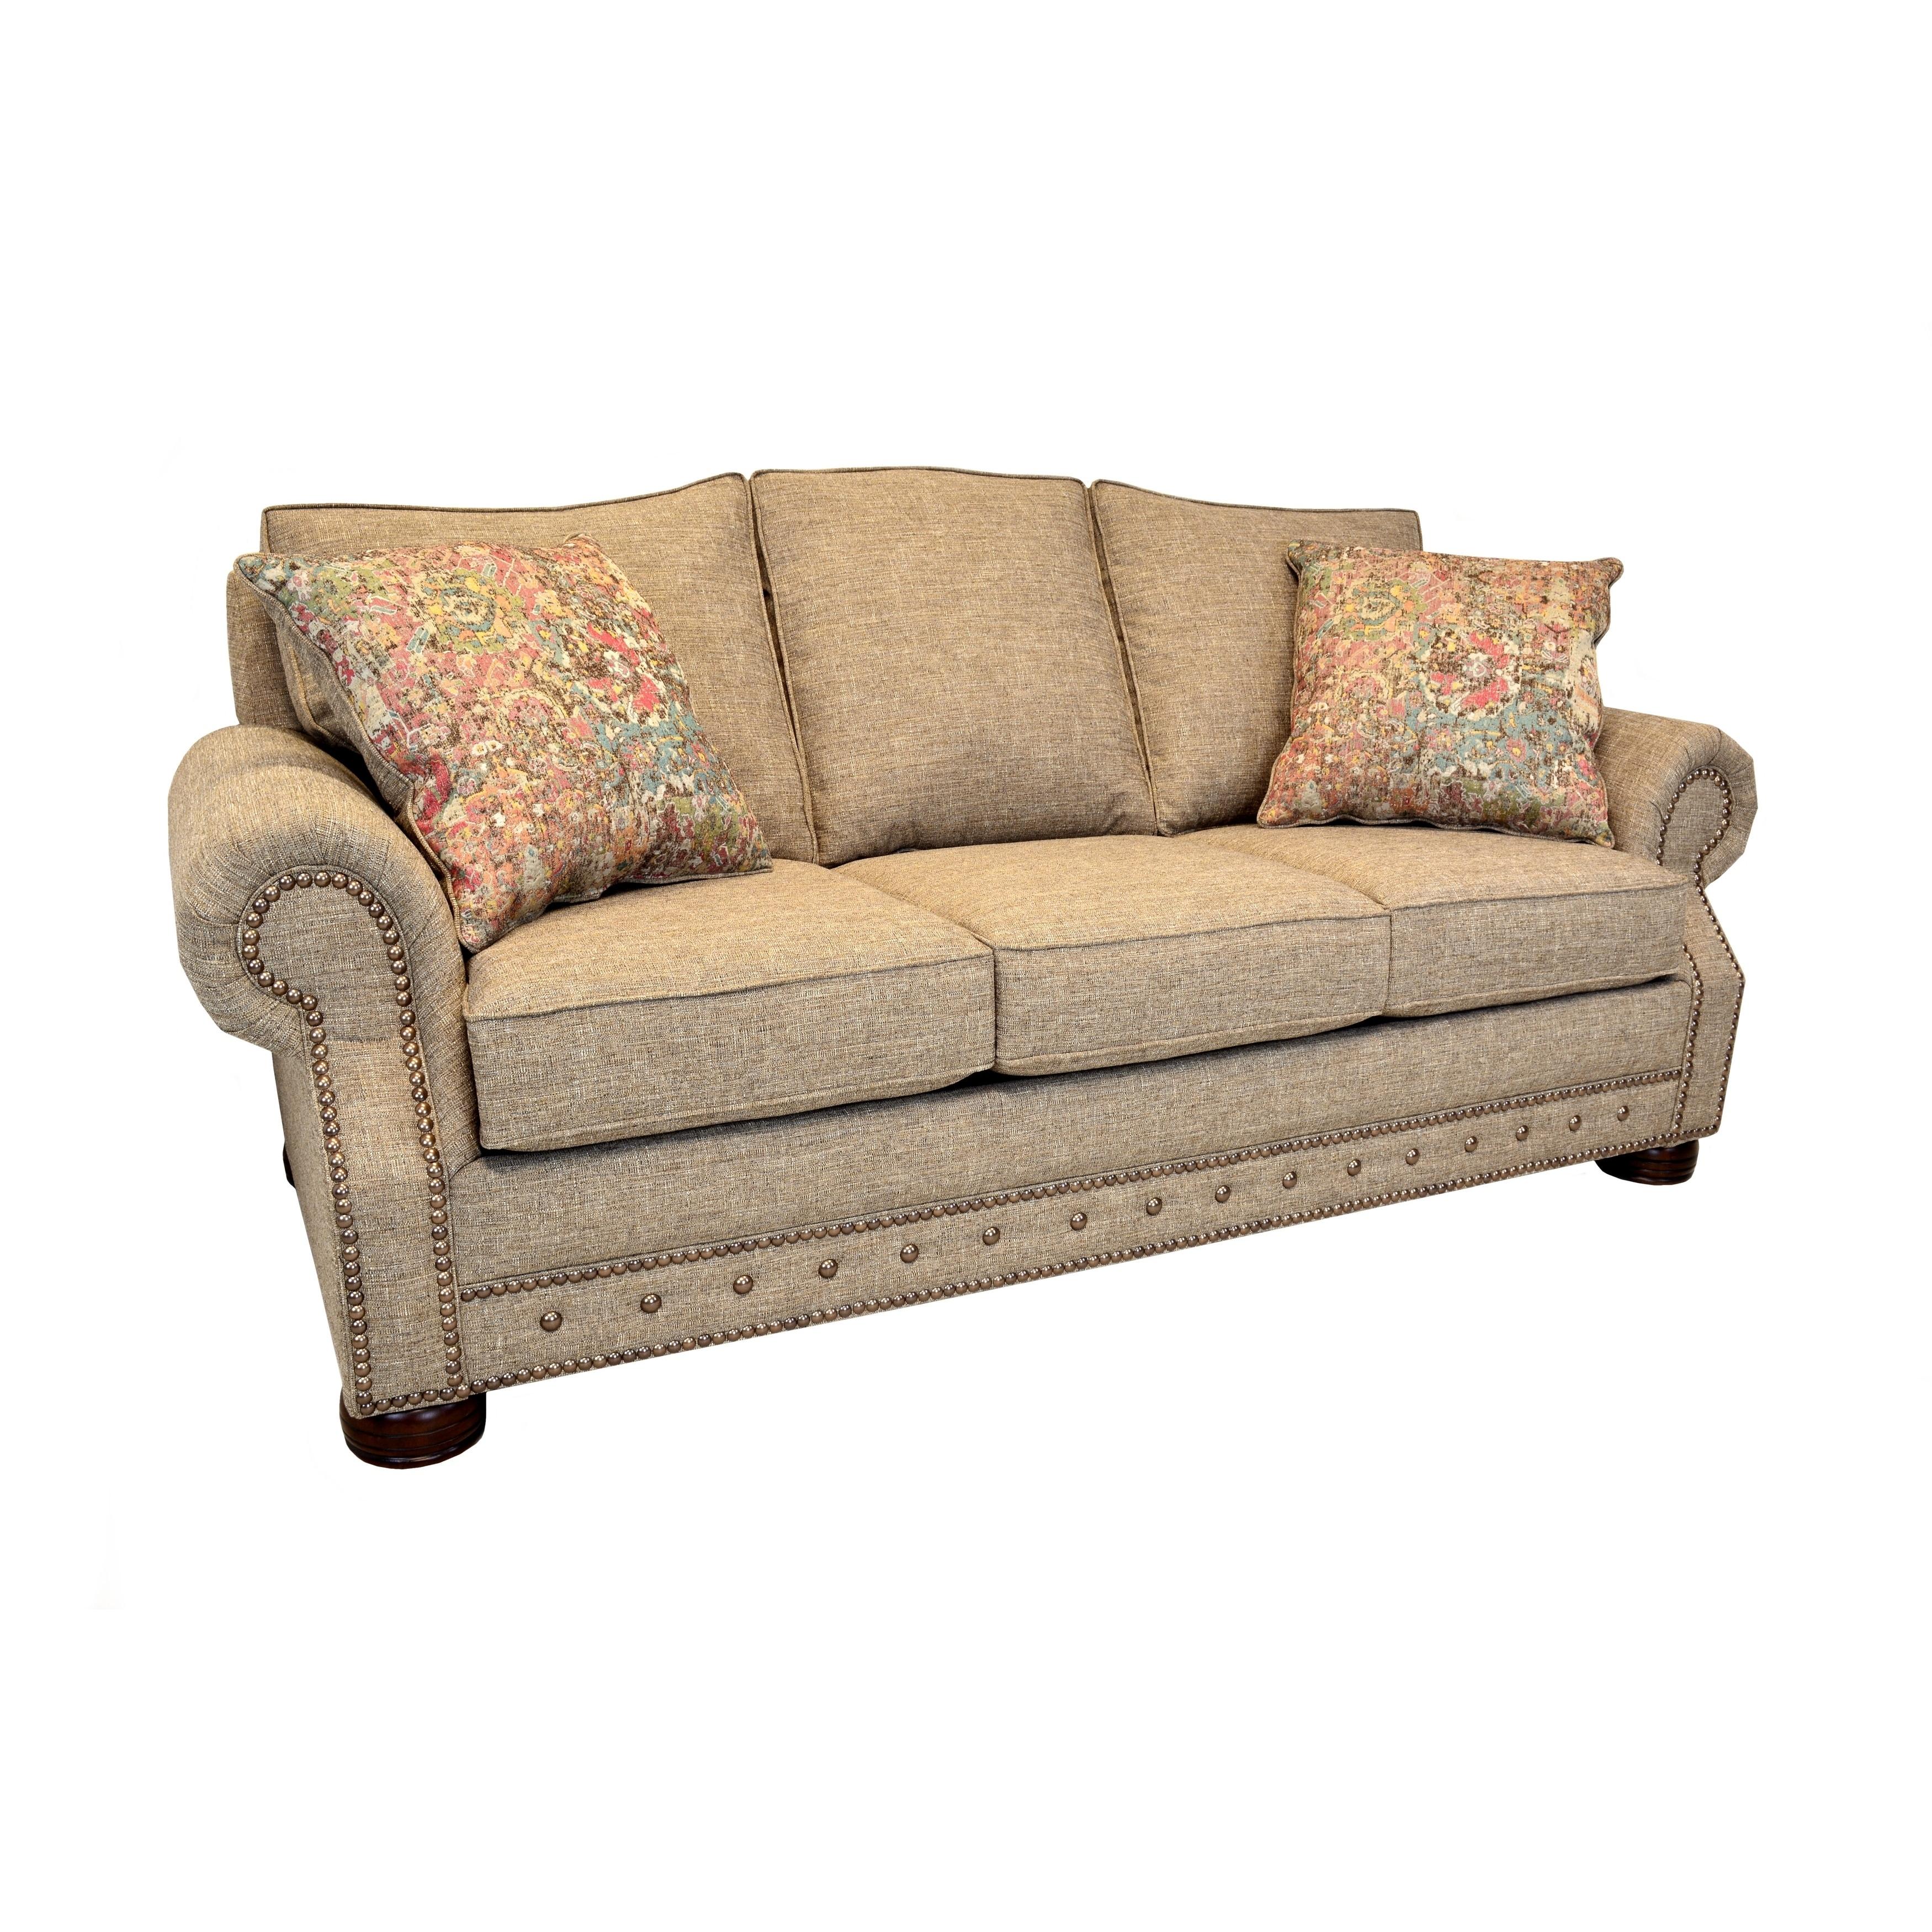 Sleeper Sofa With Nailhead Trim